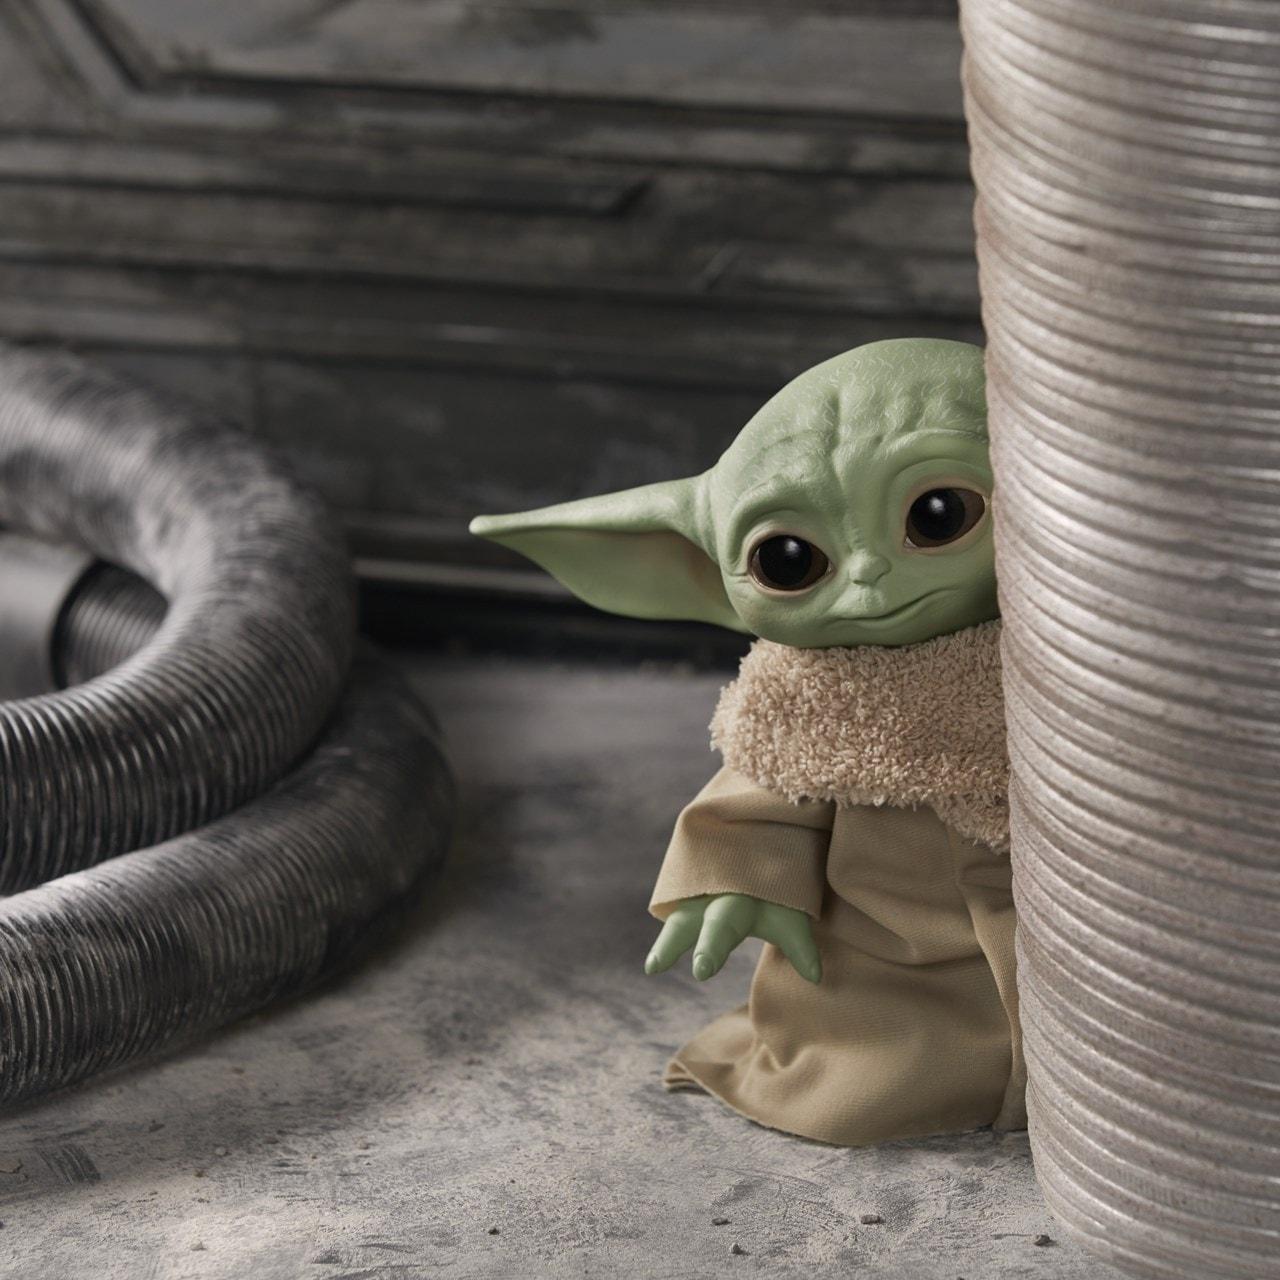 Star Wars: The Child (Baby Yoda) Talking Plush Toy - 2